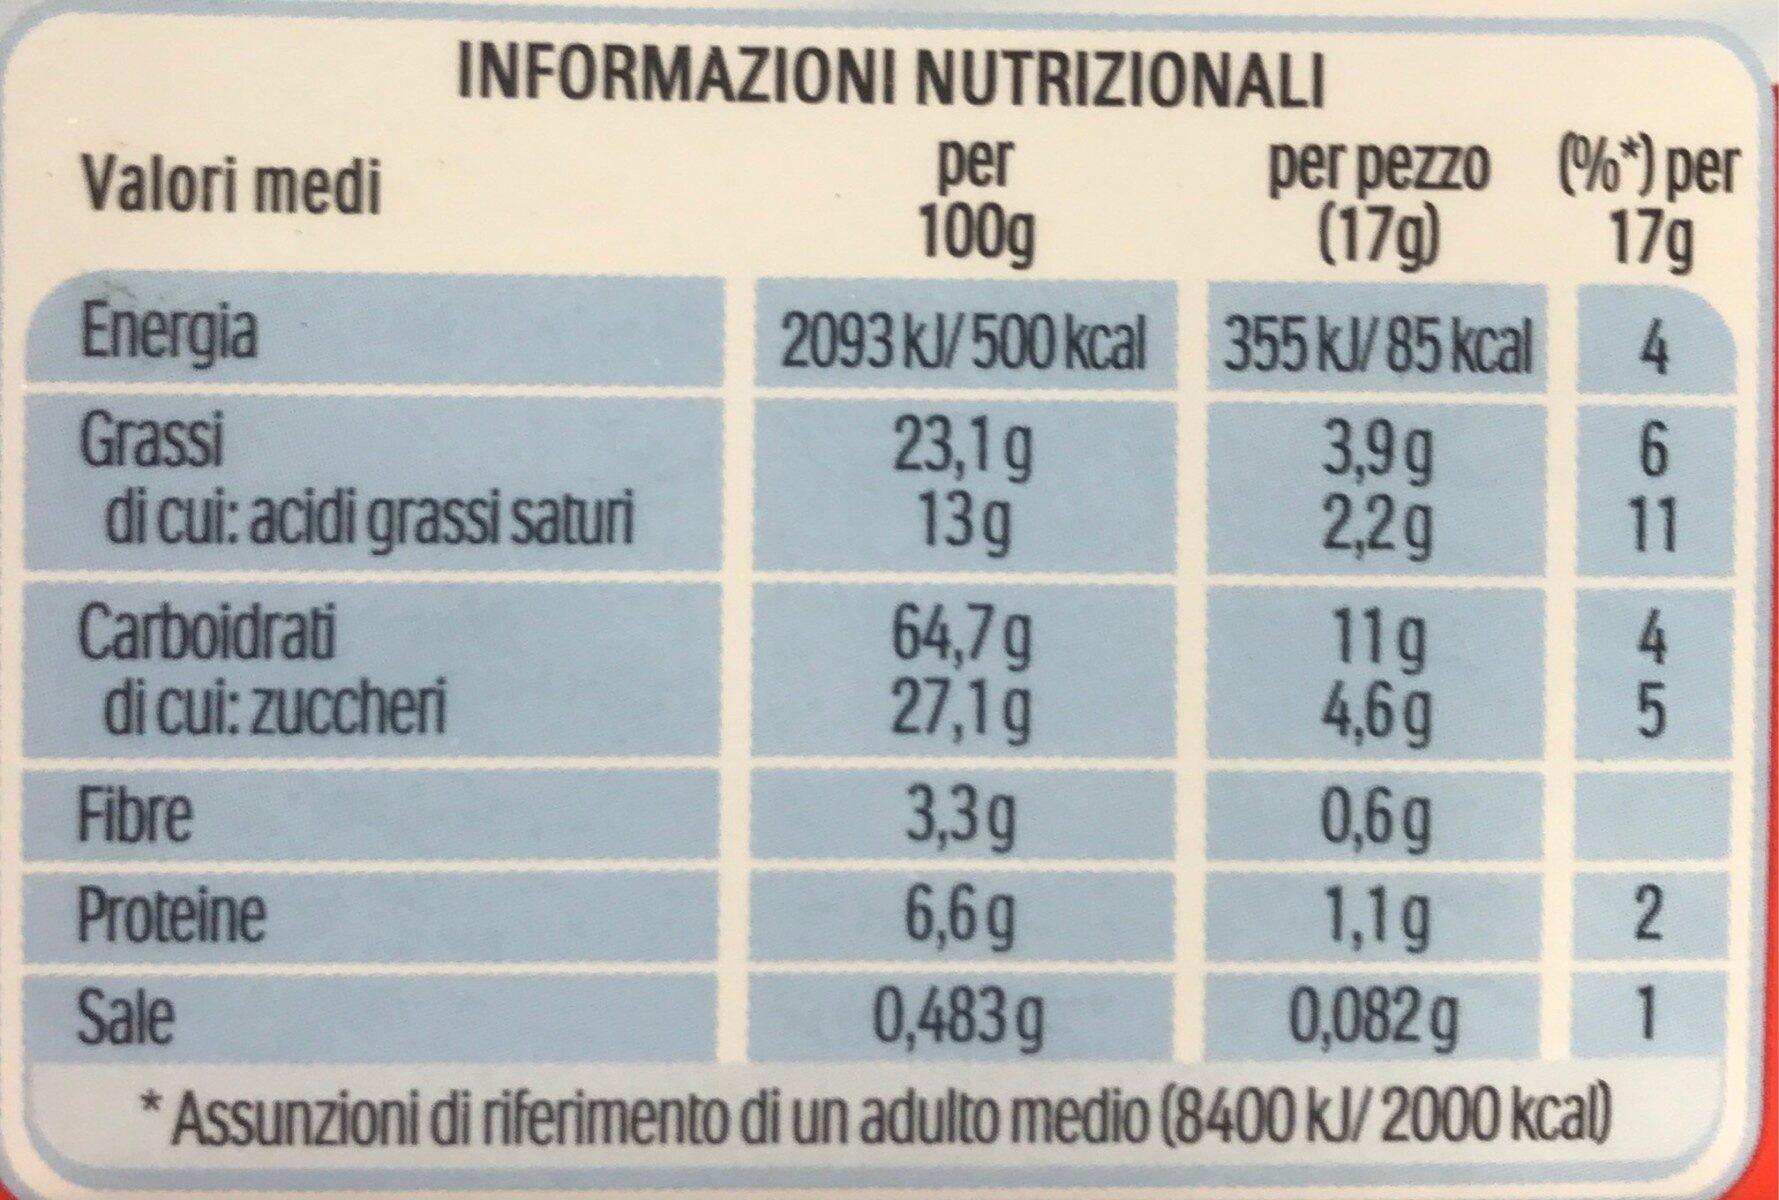 Kinder cereale chocolat noir biscuit petit dejeuner aux cereales et pepites de chocolat noir (2x6) pack de 6x2 biscuits - Valori nutrizionali - fr